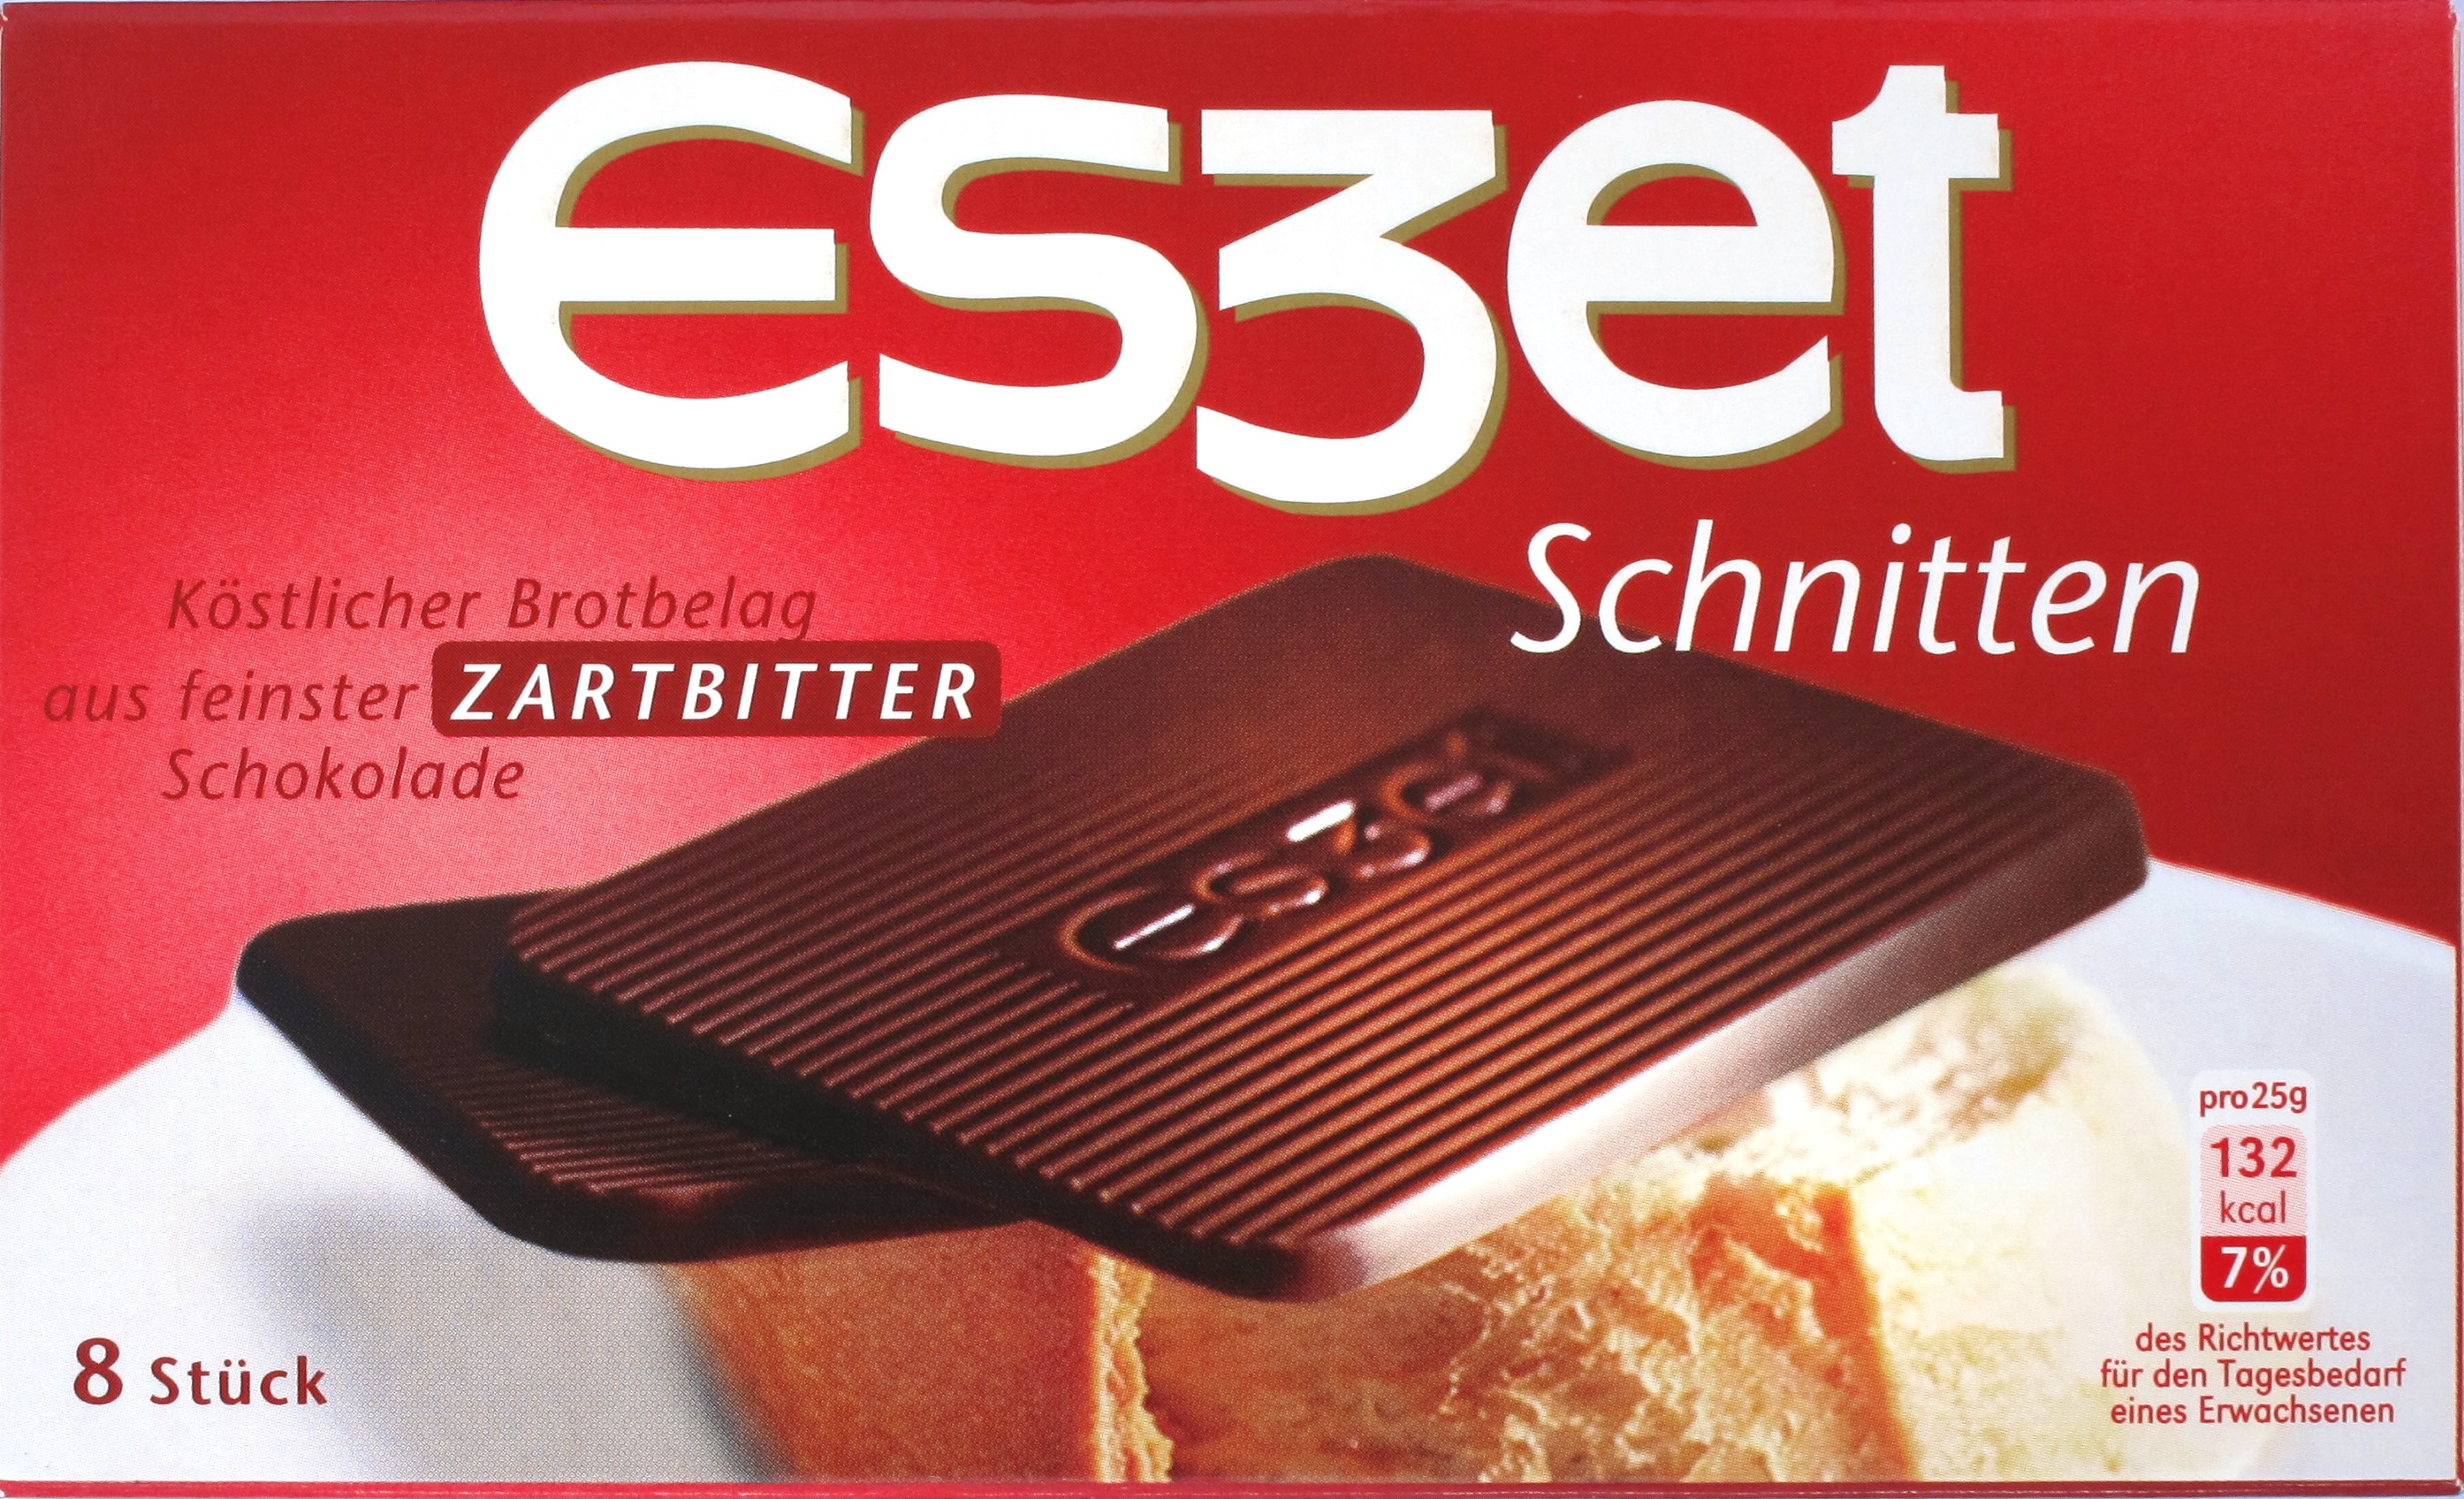 Eszet-Schnitten 50% Zartbitter